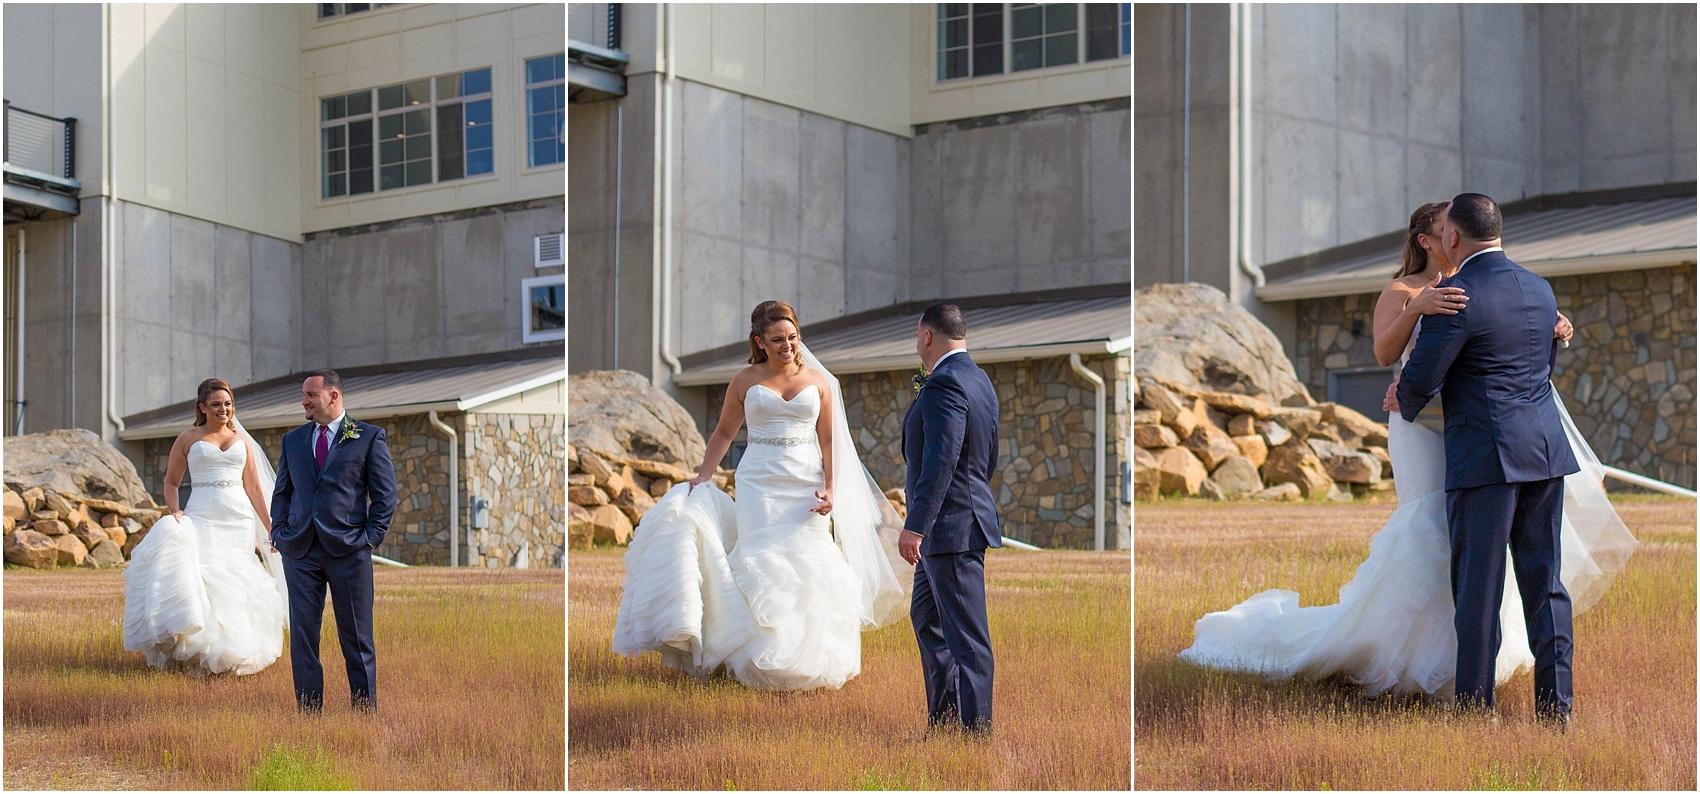 Blue Valley Winery Wedding Feather n Oak Photography_0031.jpg